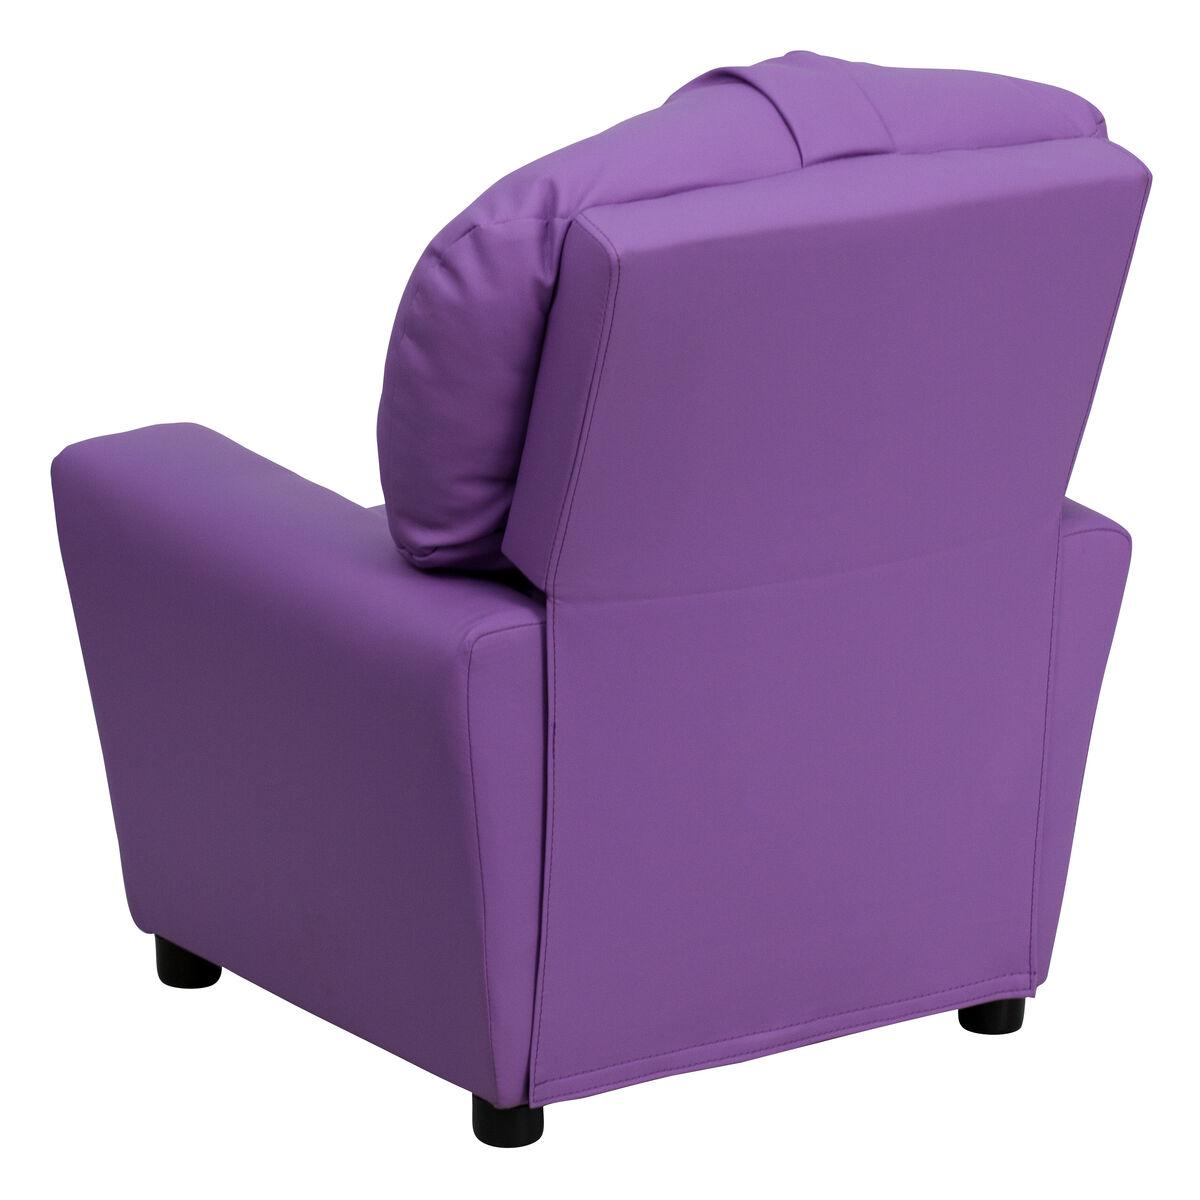 Groovy Contemporary Lavender Vinyl Kids Recliner With Cup Holder Machost Co Dining Chair Design Ideas Machostcouk